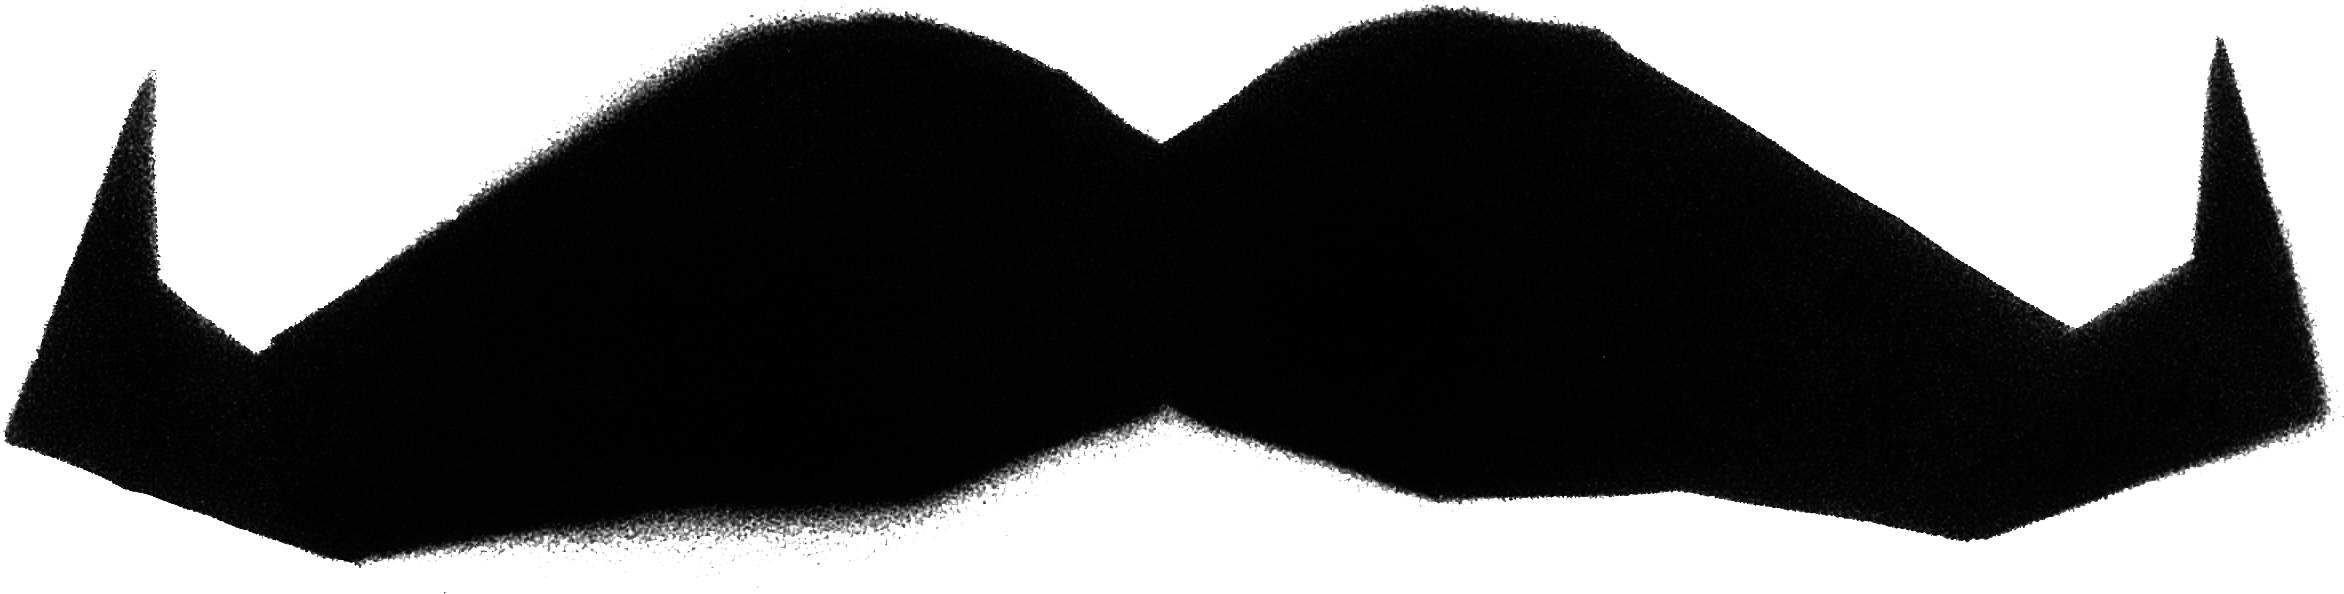 Mustache clipart biker. Movember coming to an